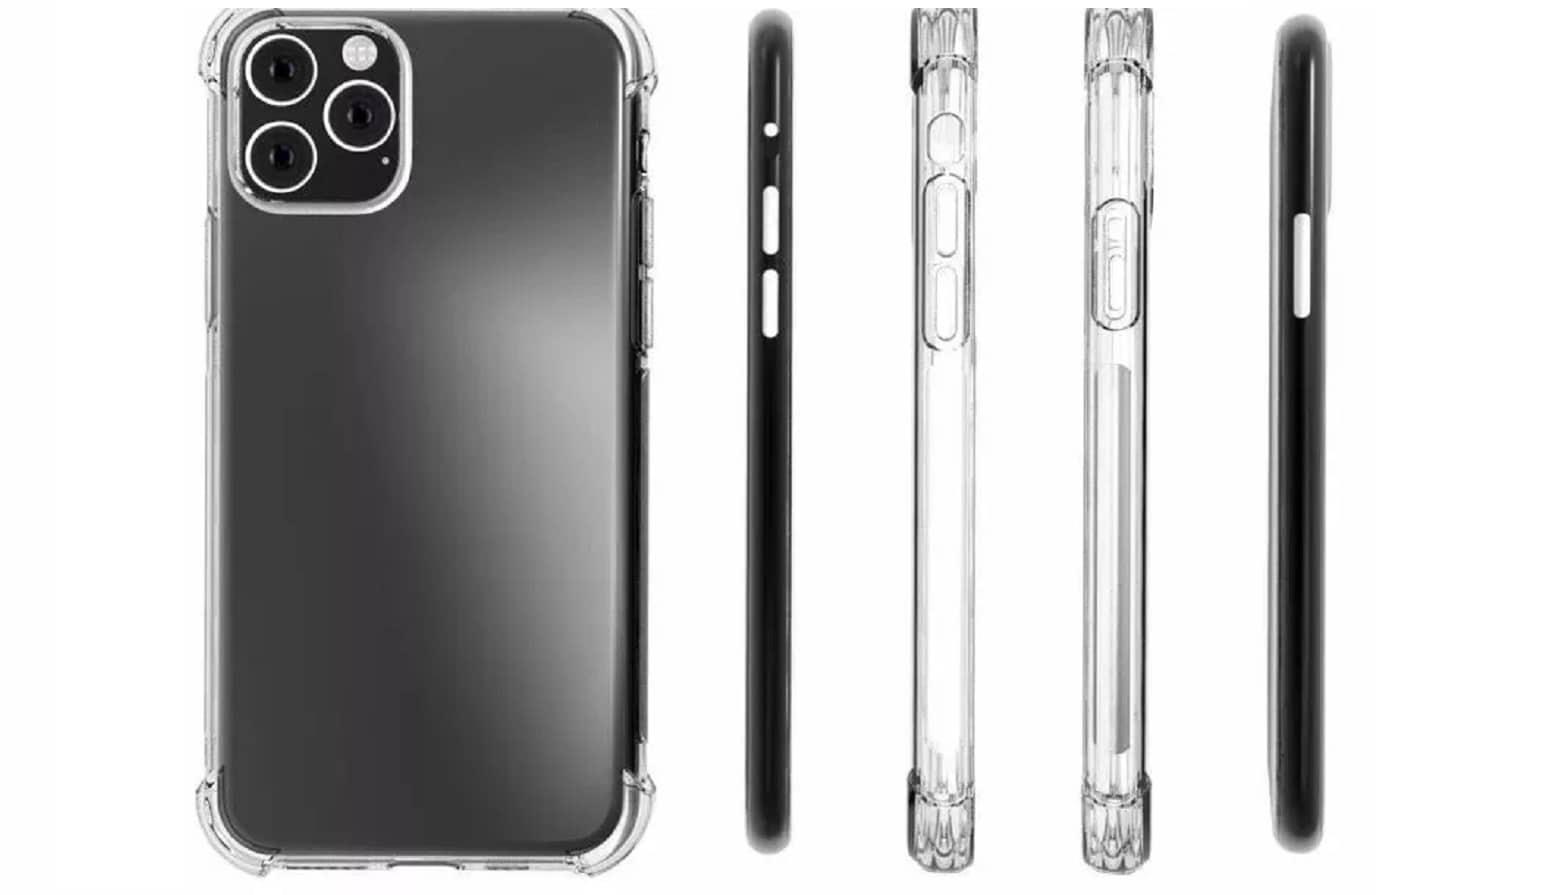 2019 apple iphone camera bump case render